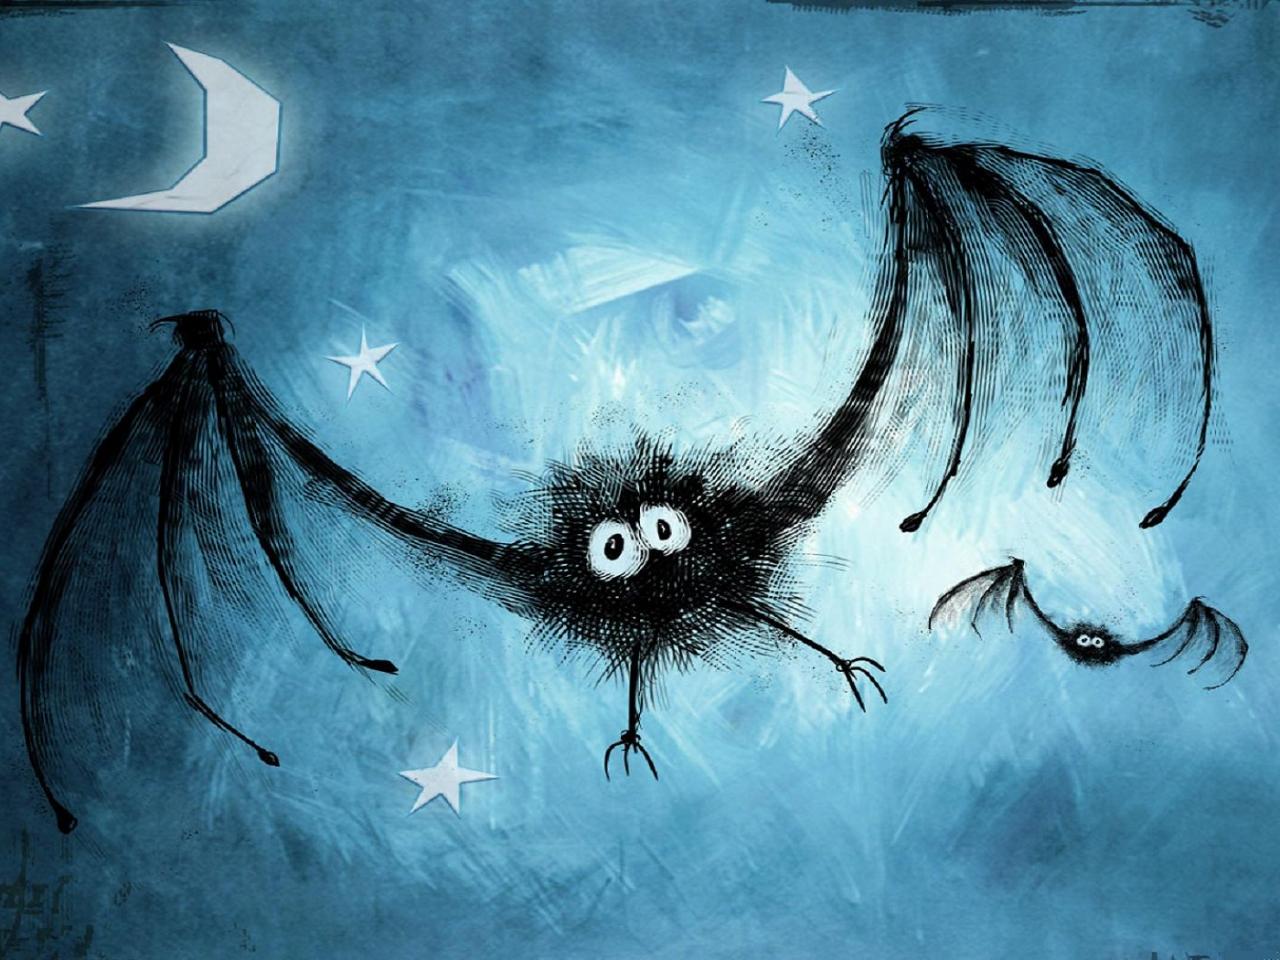 Dibujo de murcielagos - 1280x960